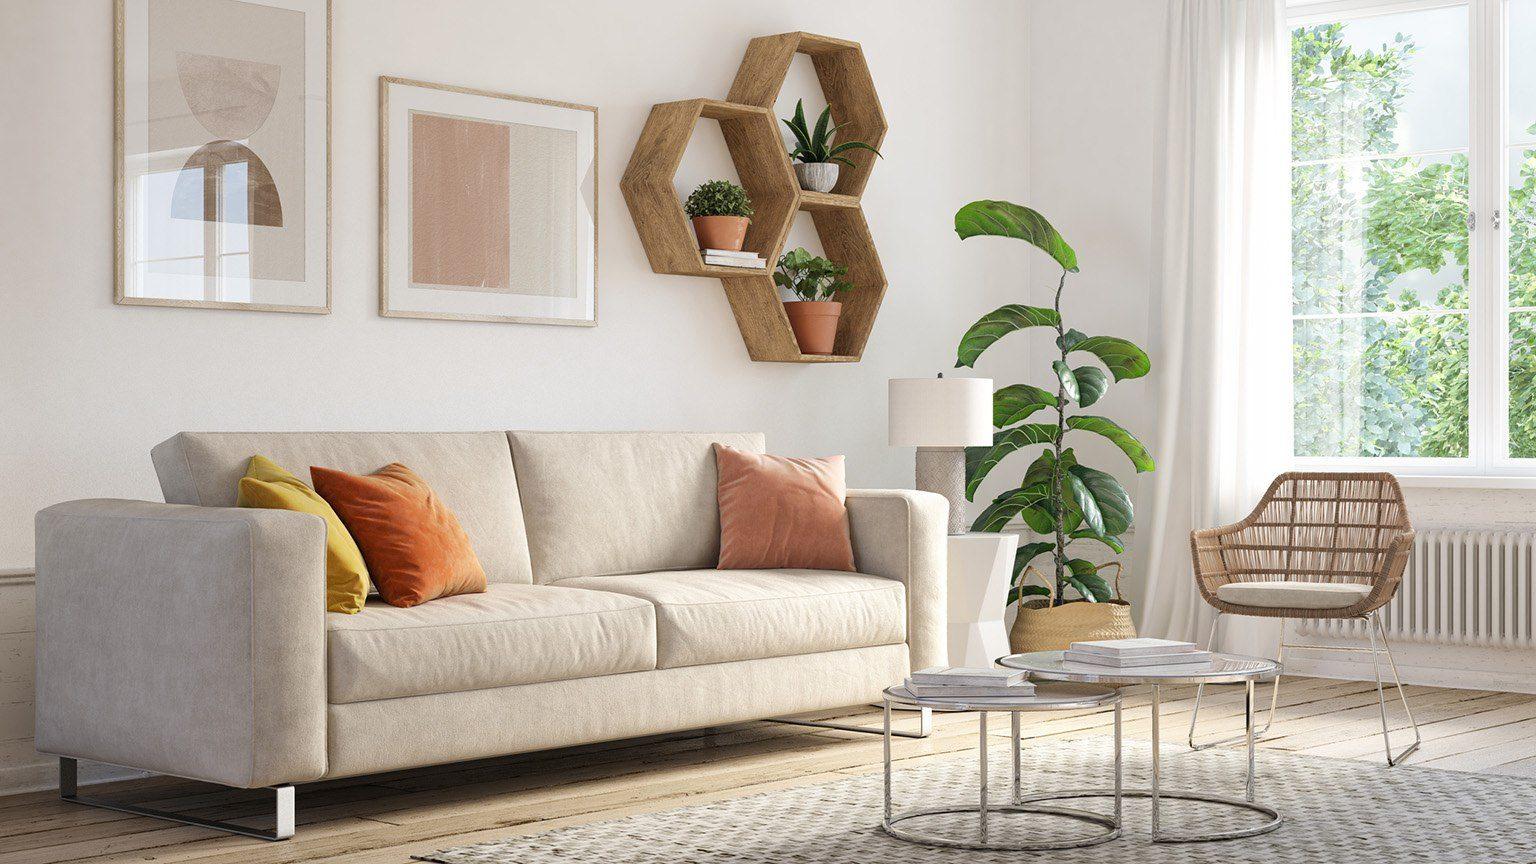 Bohemian living room interior